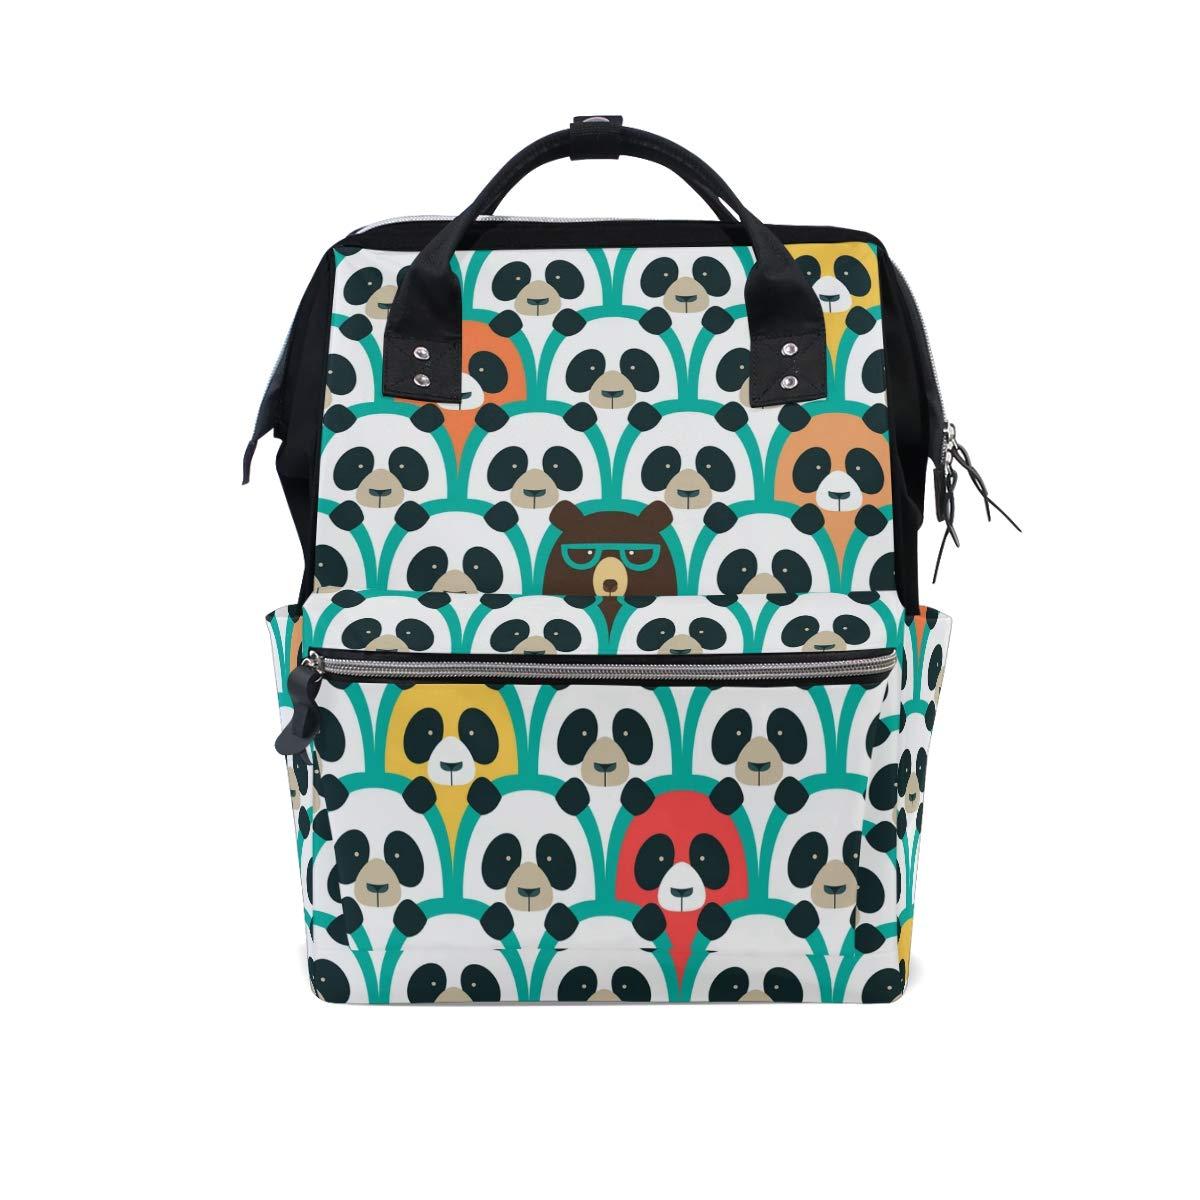 MERRYSUGAR Diaper Bag Baby Bag School Backpack Mommy Bag Cute Bear Funny Animal Large Multifunction Travel Bag Mommy Bag